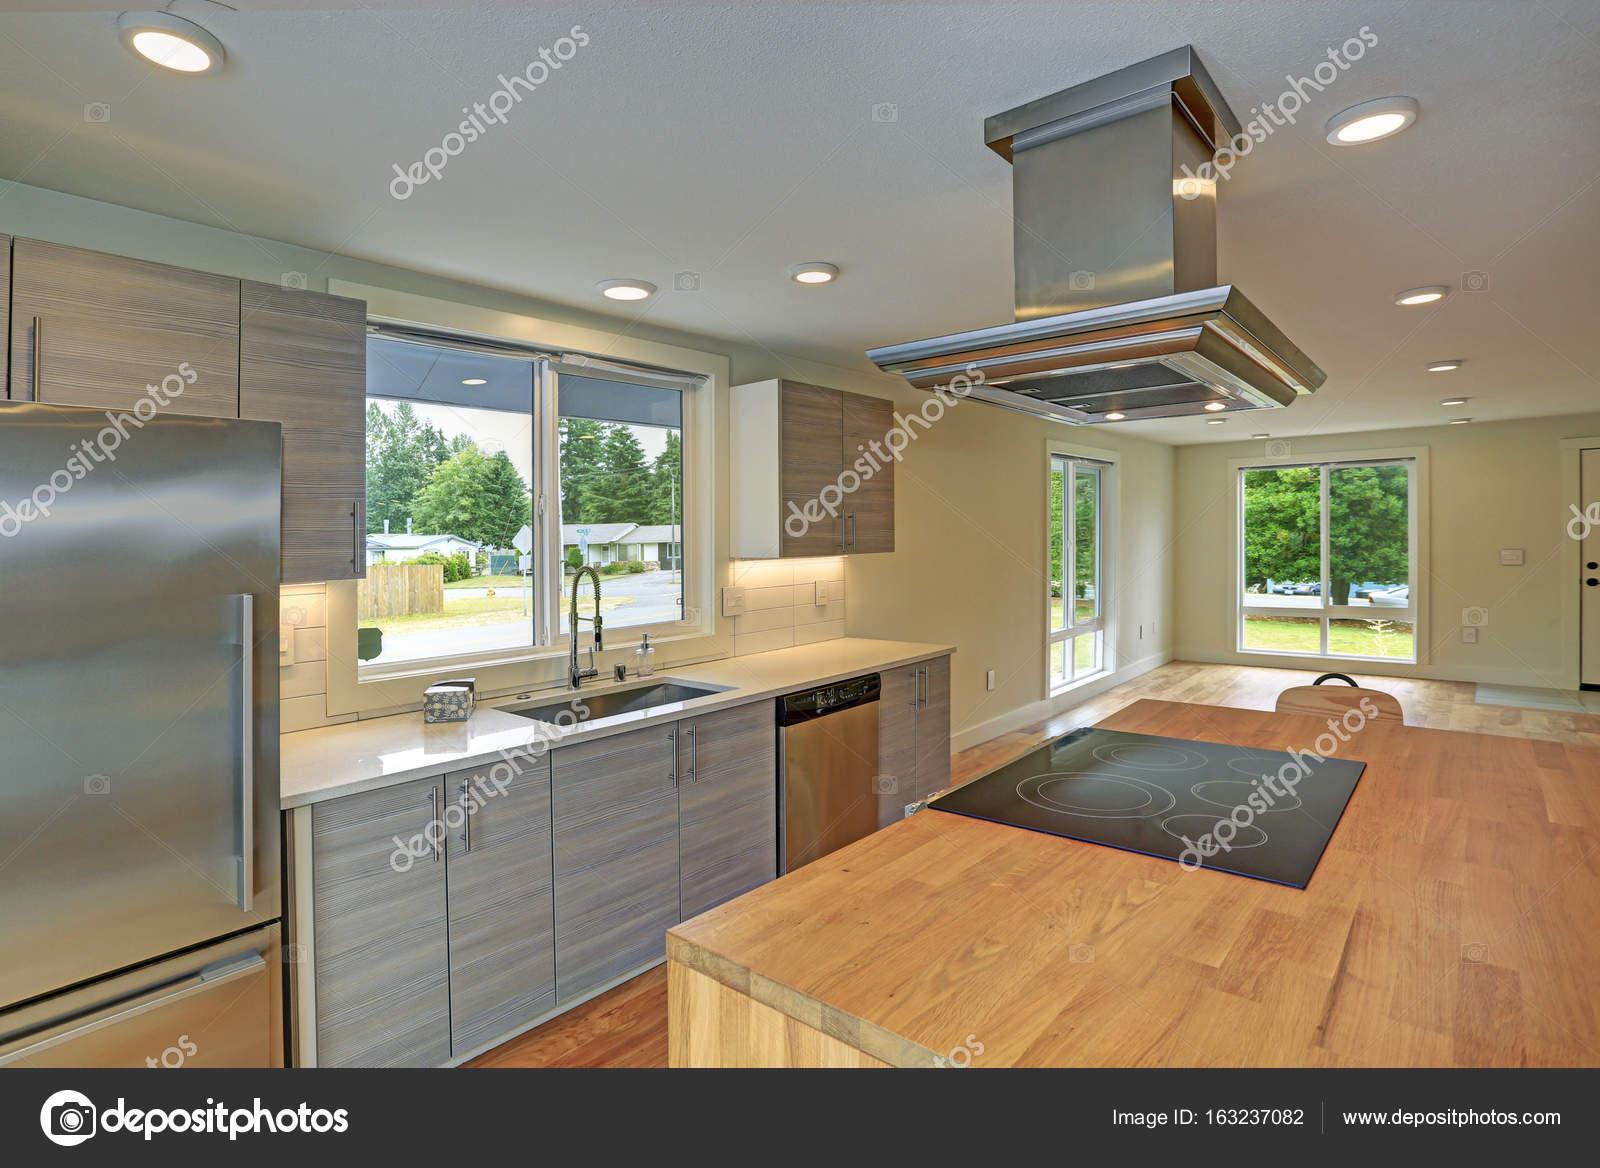 island kitchen hood wall fan 新改建的厨房拥有带兜帽的厨房岛 图库照片 c alabn 163237082